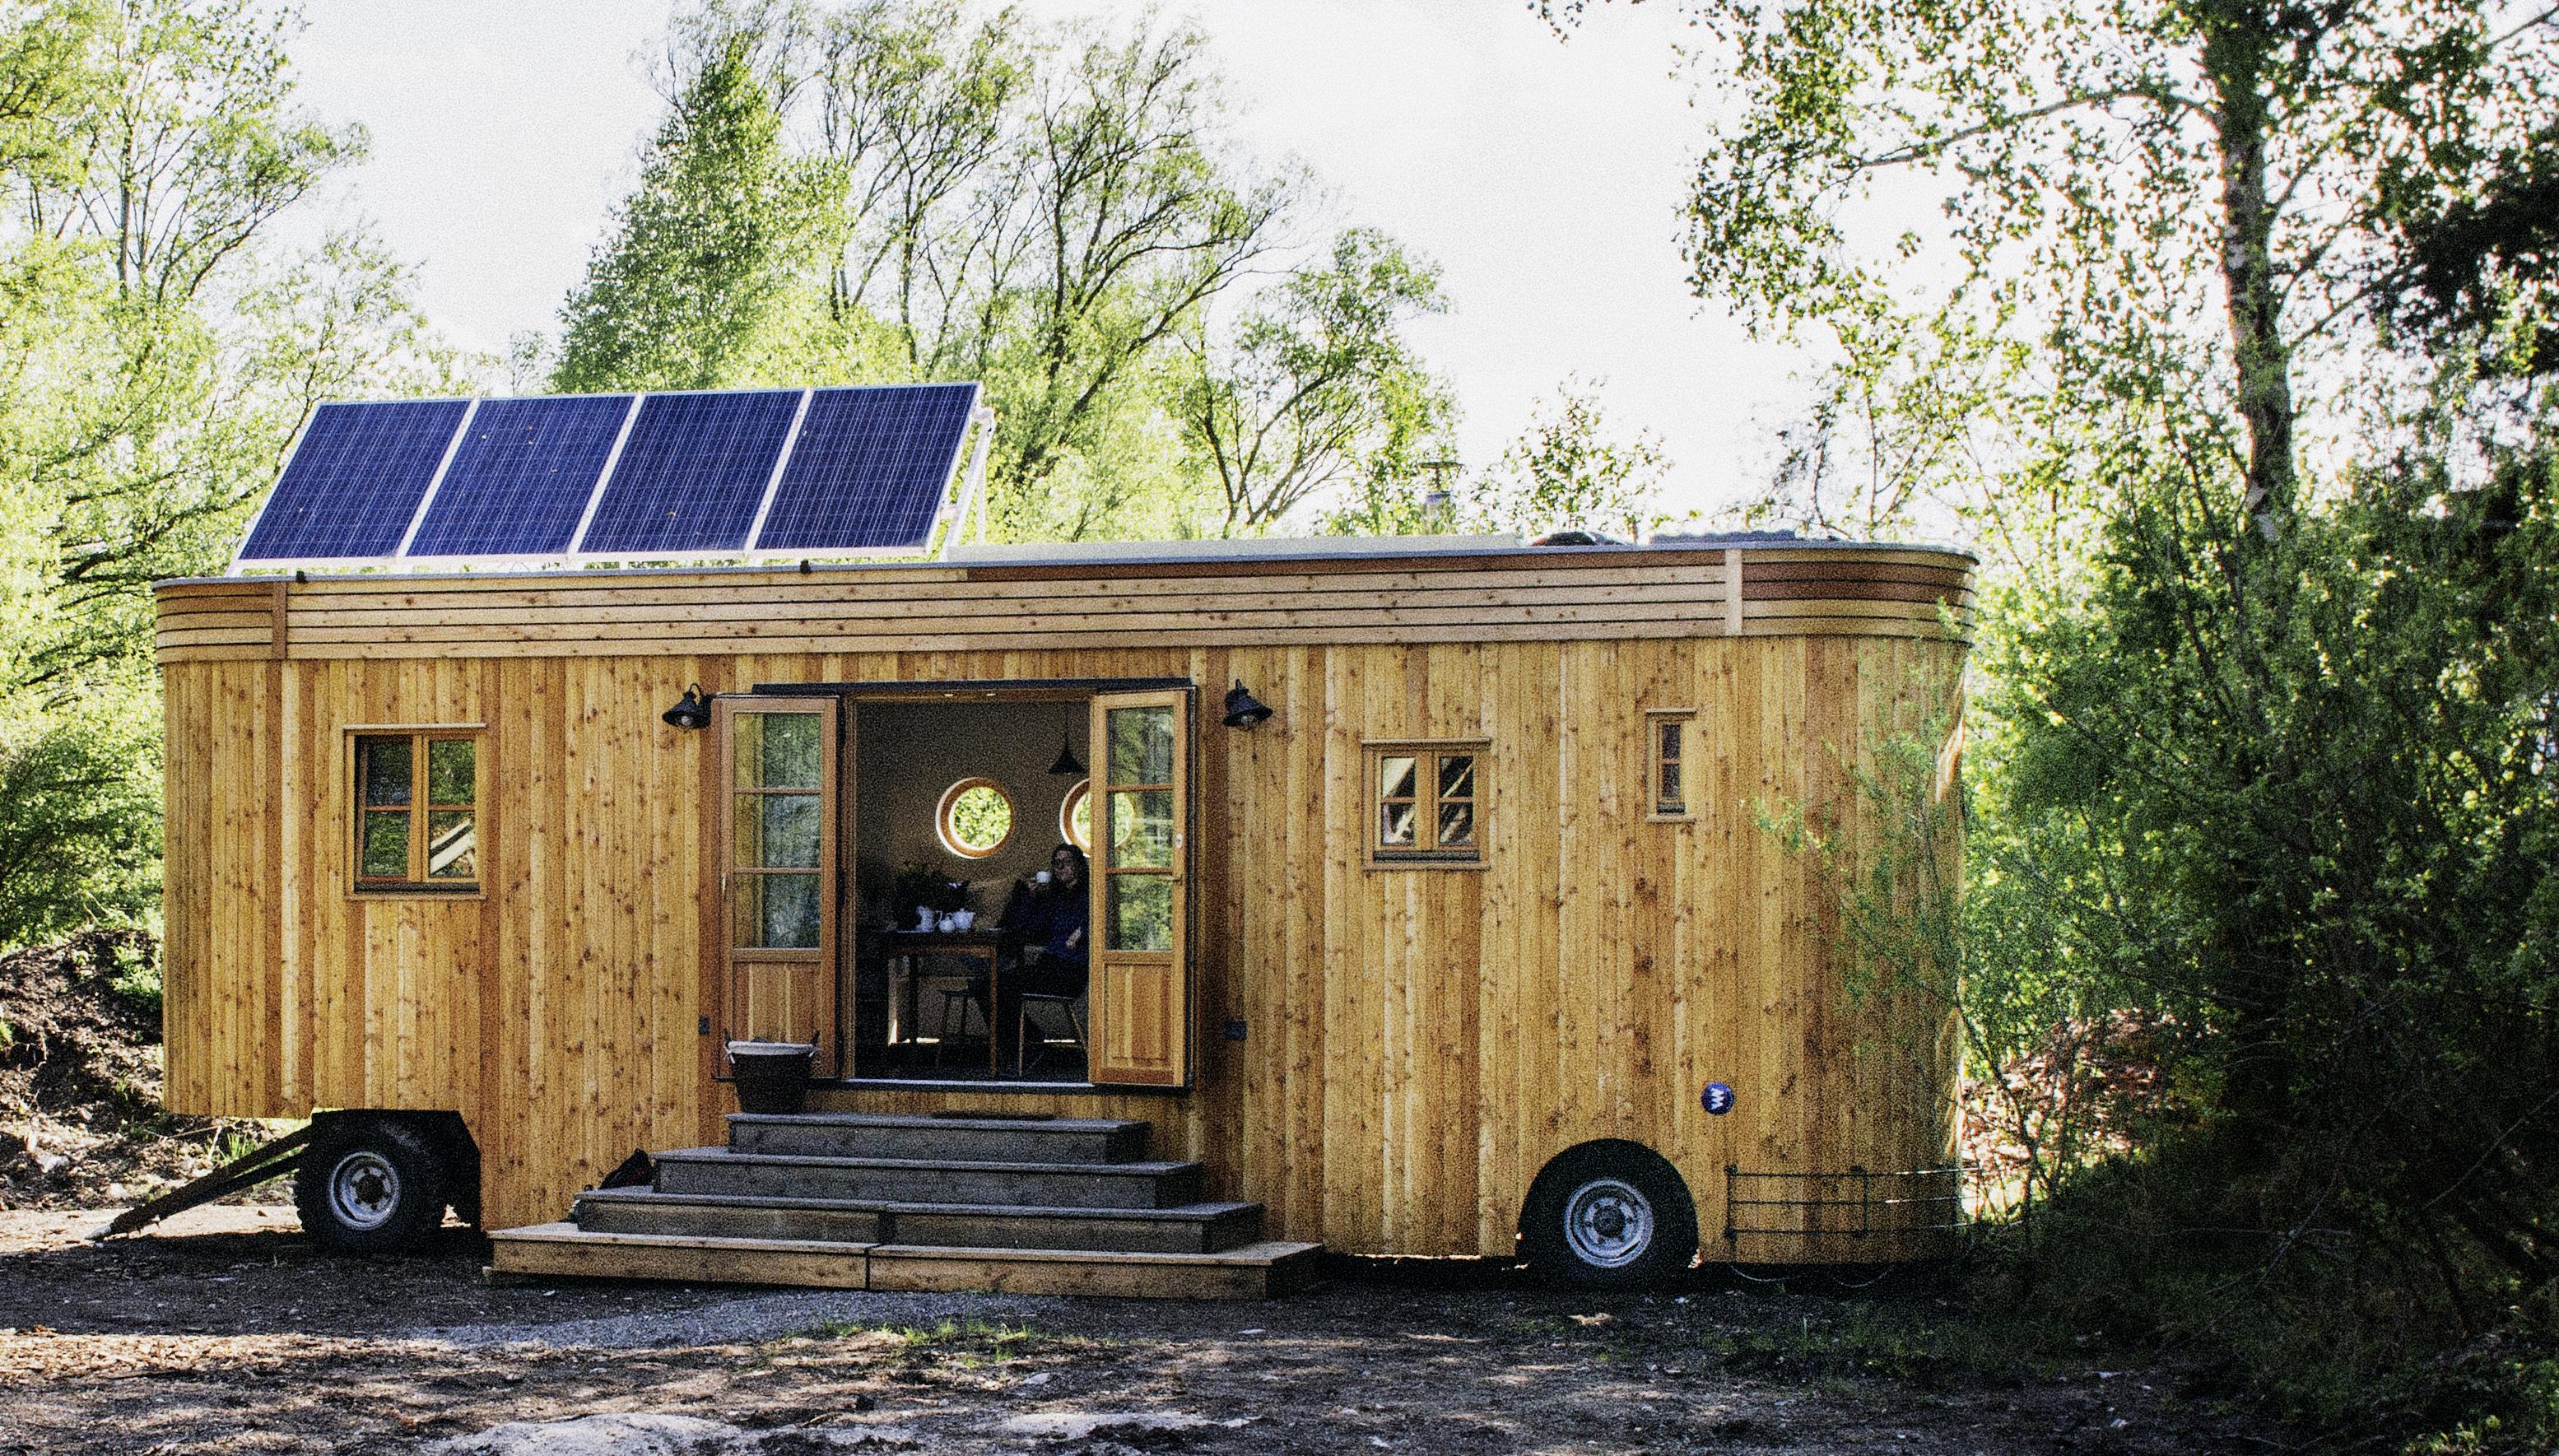 autark leben im wohnwagen energie tipp. Black Bedroom Furniture Sets. Home Design Ideas